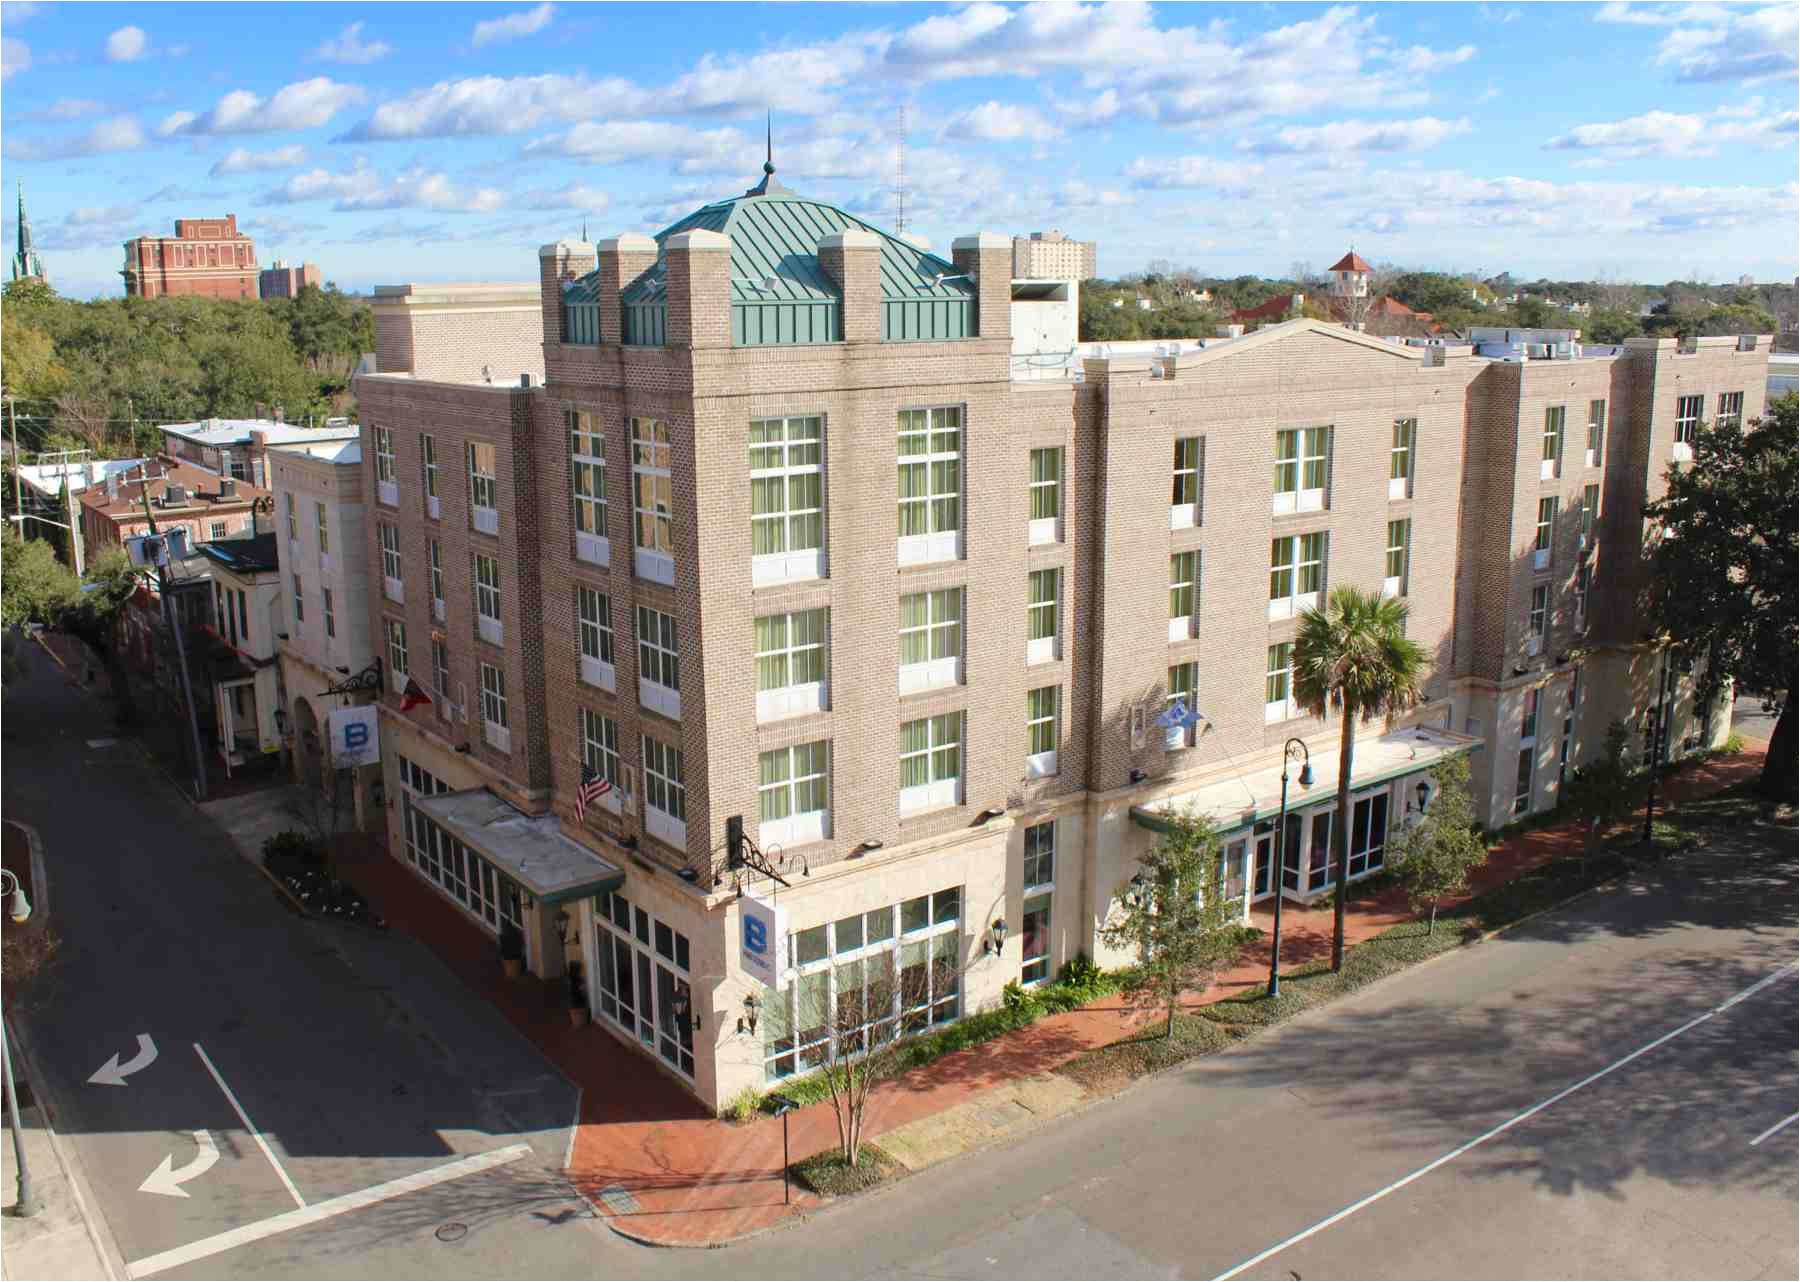 b historic savannah hotel georgia exterior 585dc9af3df78ce2c37b7af5